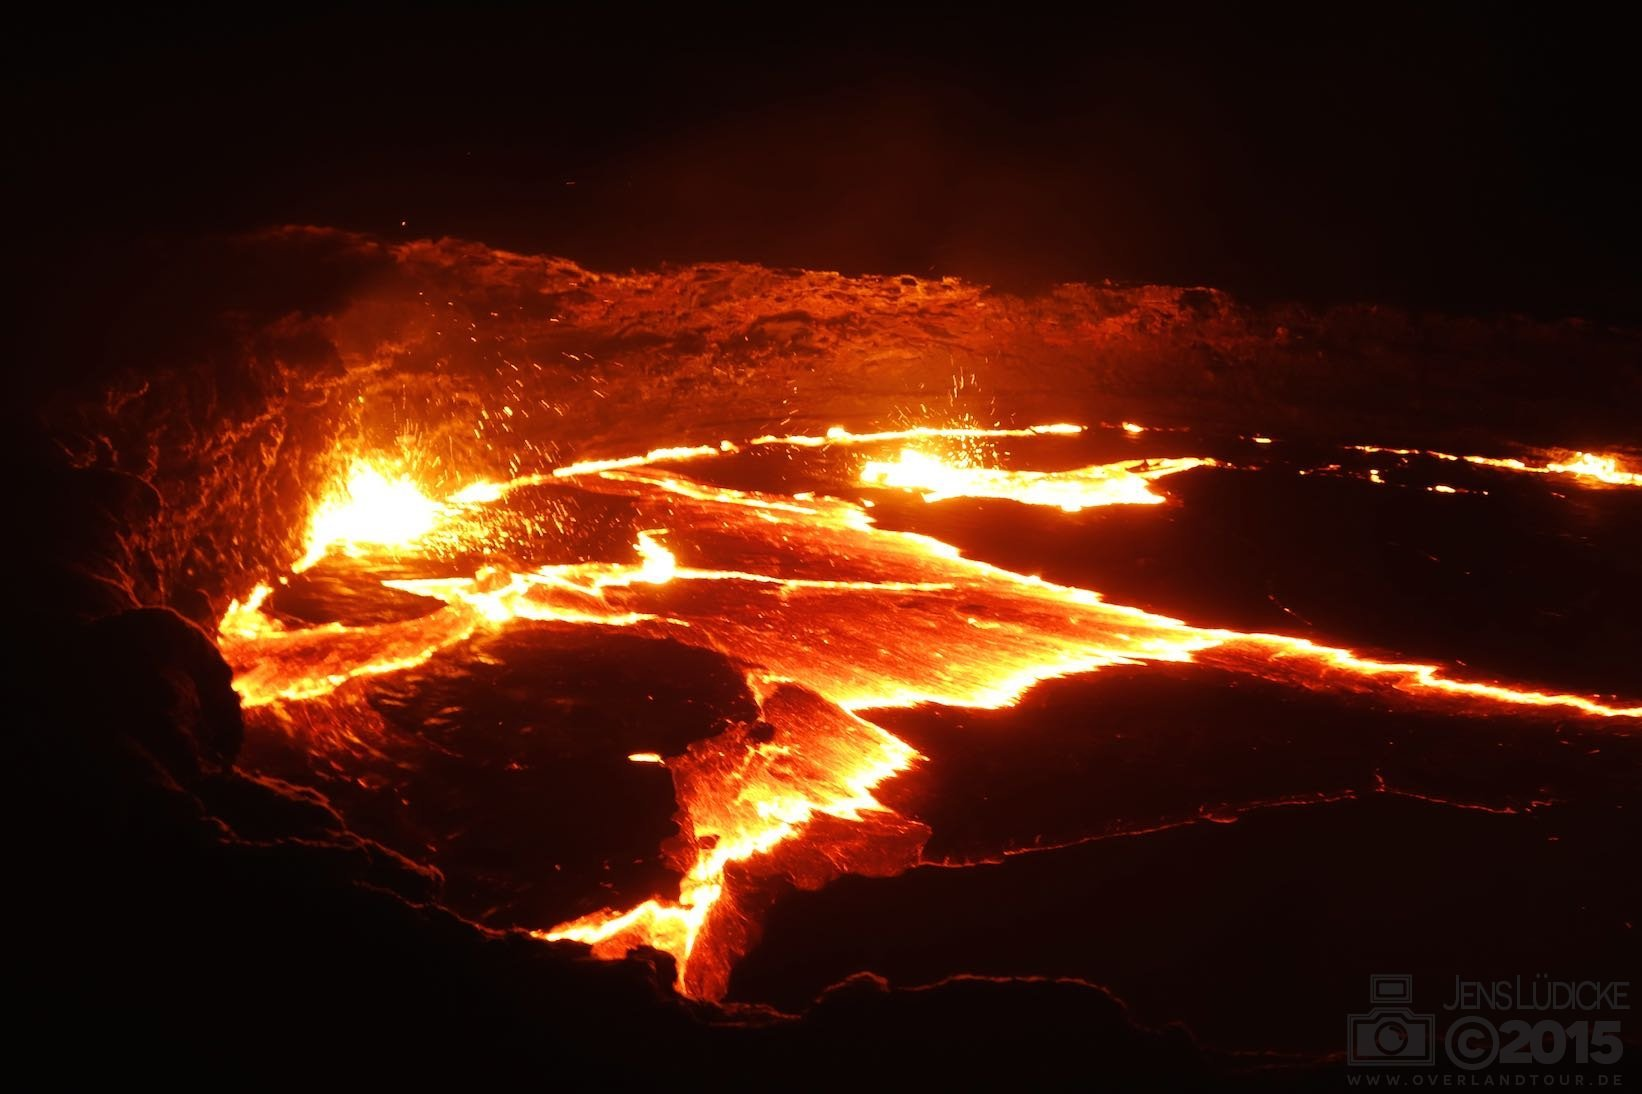 Erta Ale - Der brodelnde Vulkan